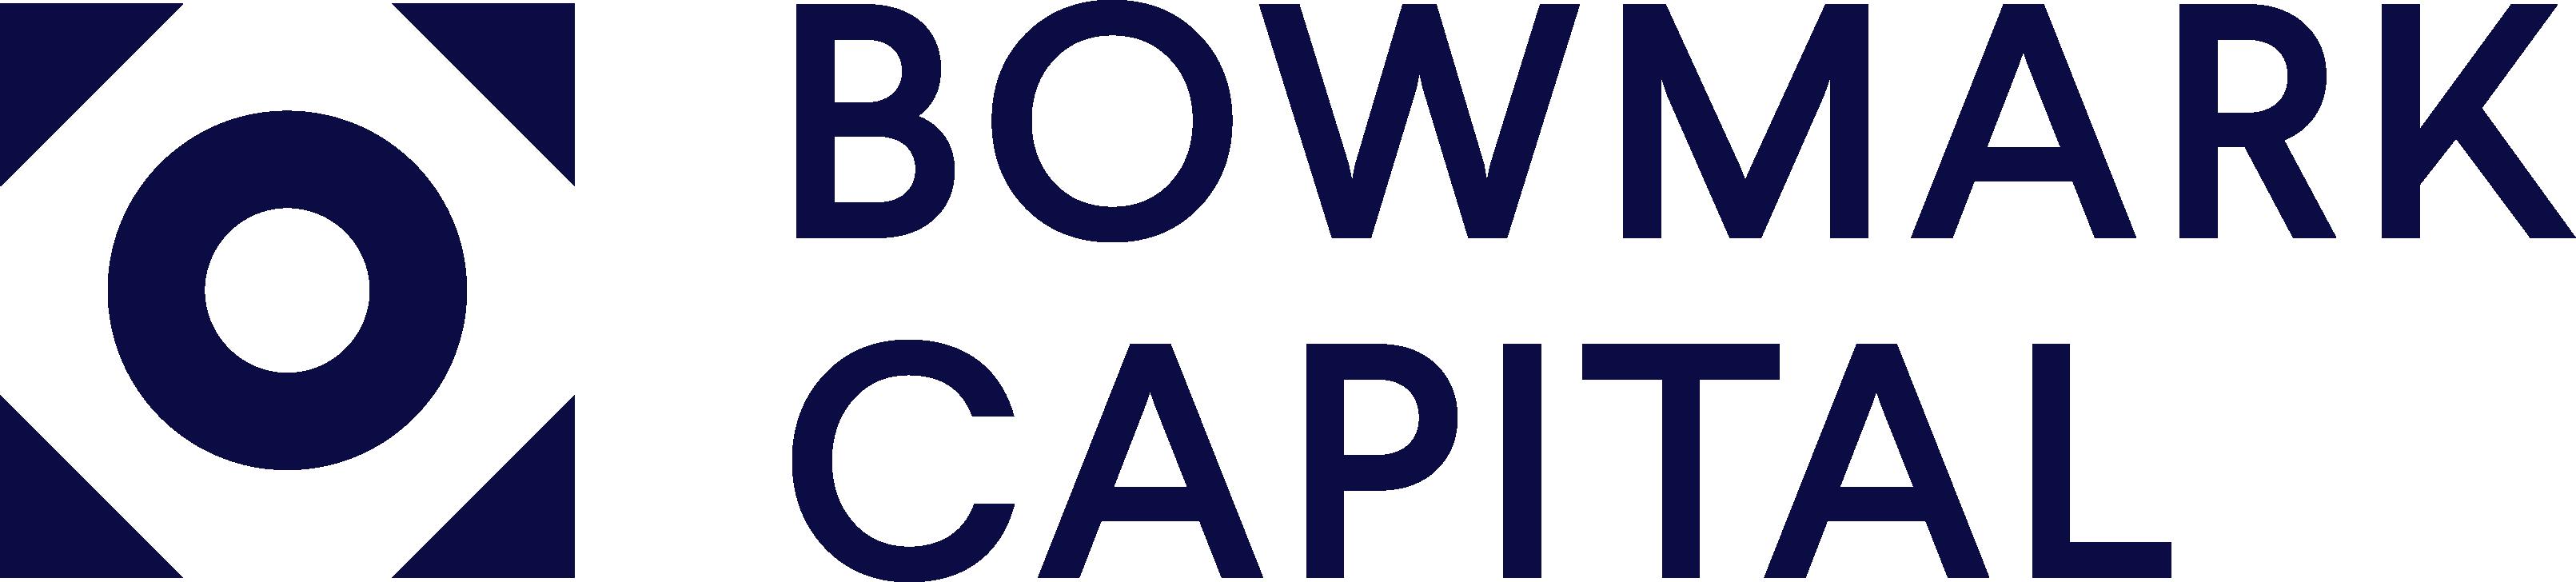 Bowmark Capital